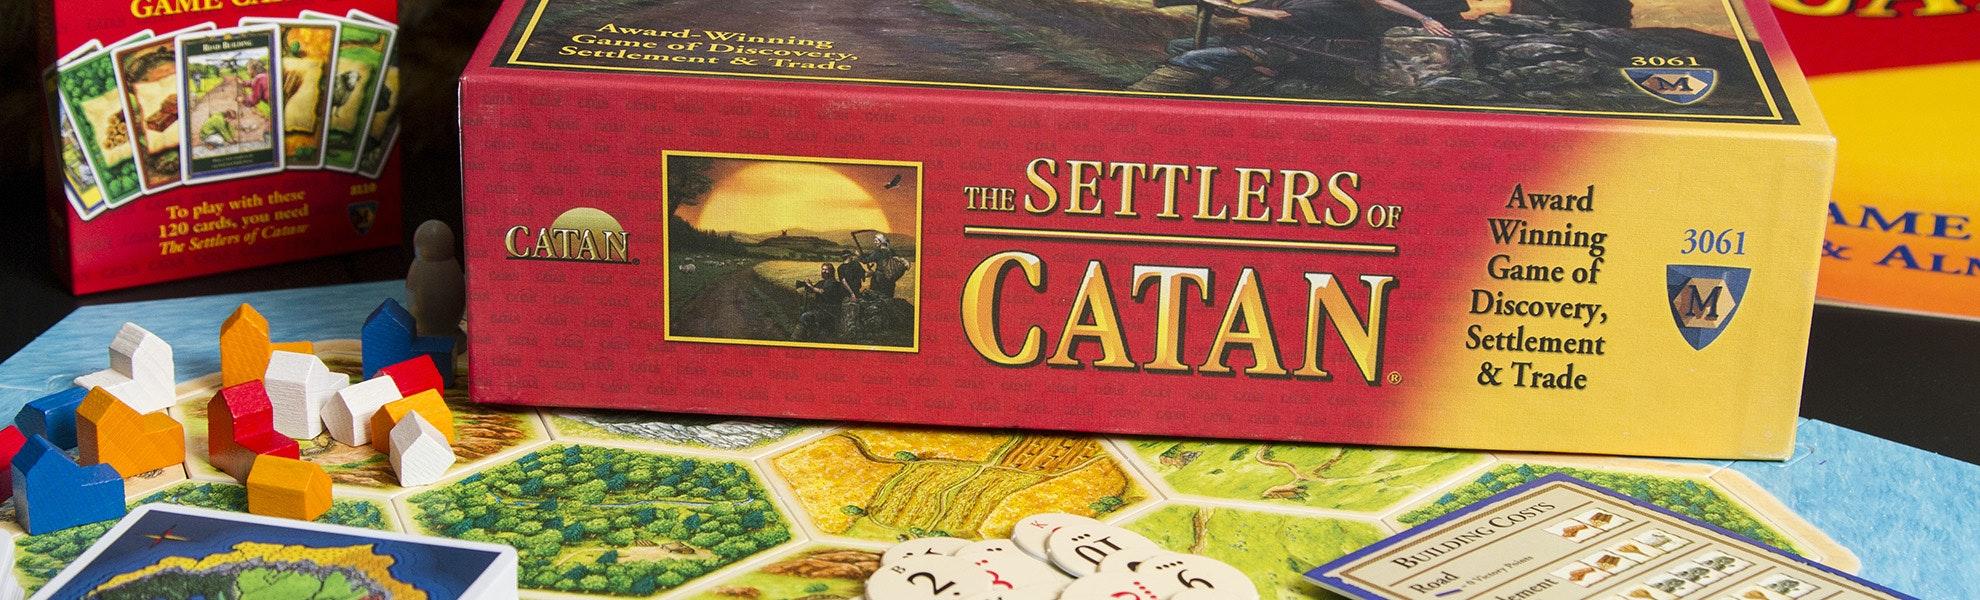 Settlers of Catan Board Game Bundle